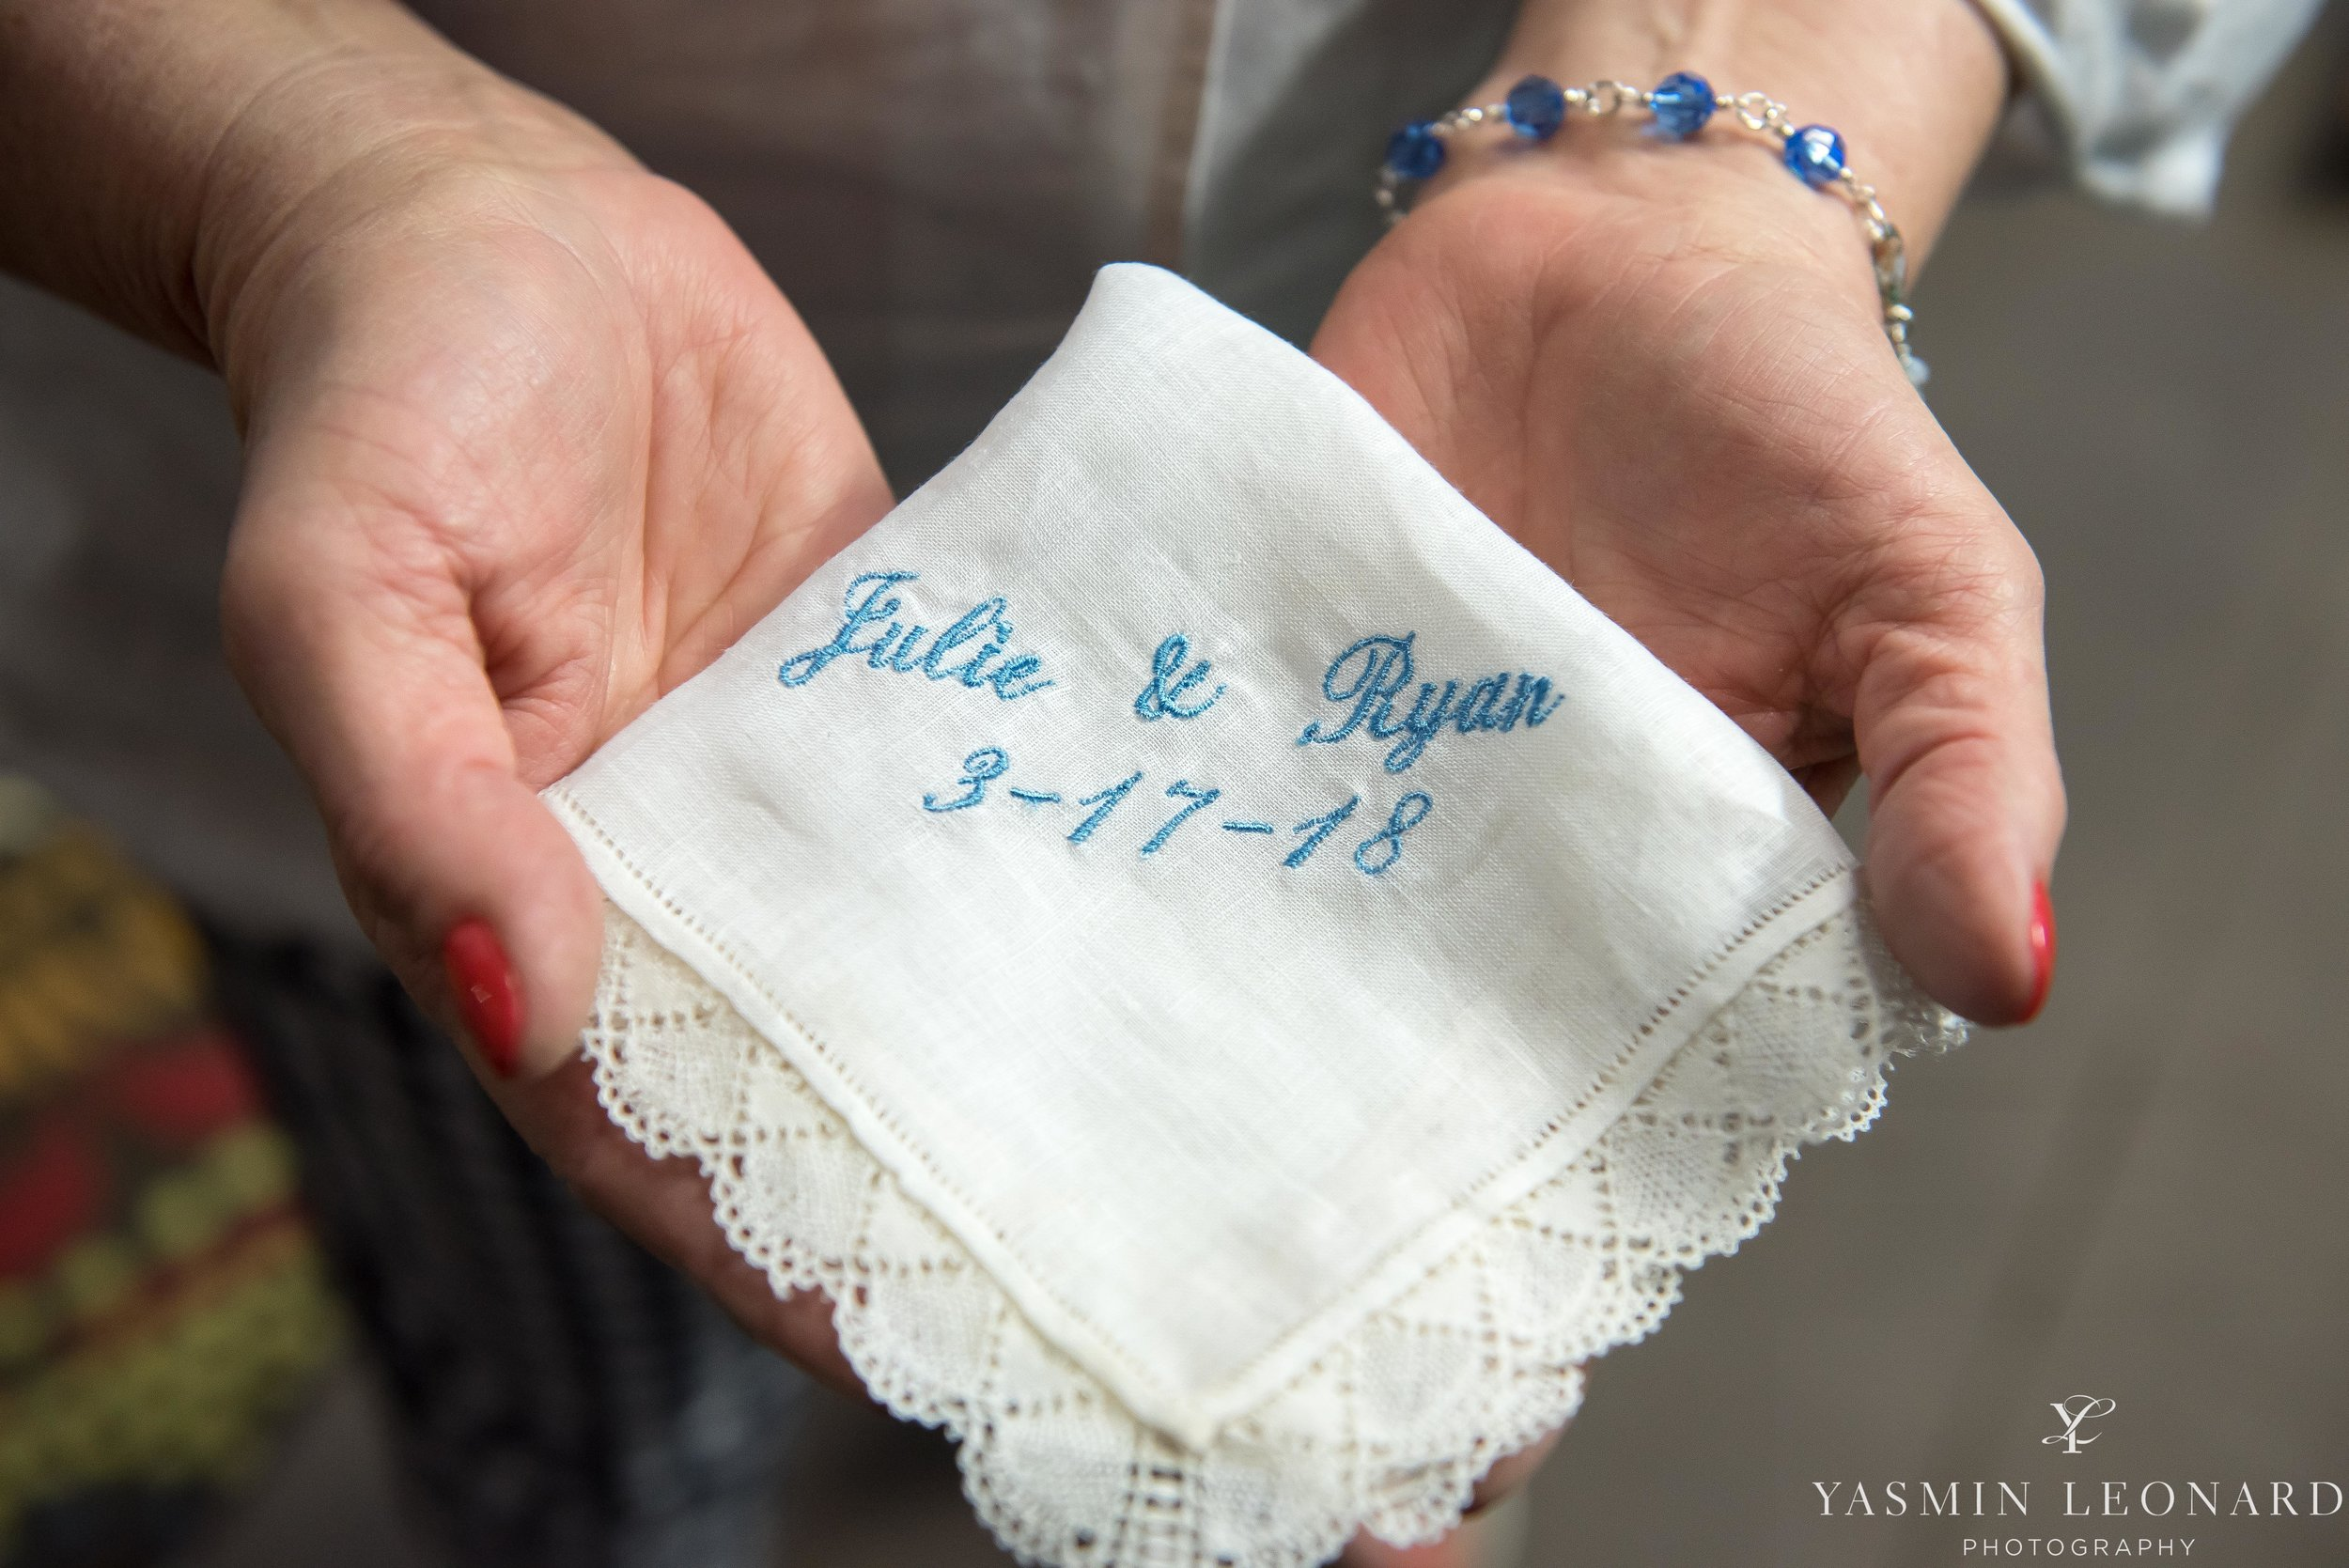 Adaumont Farm - Adaumont Farm Weddings - Trinity Weddings - NC Weddings - Yasmin Leonard Photography-7.jpg